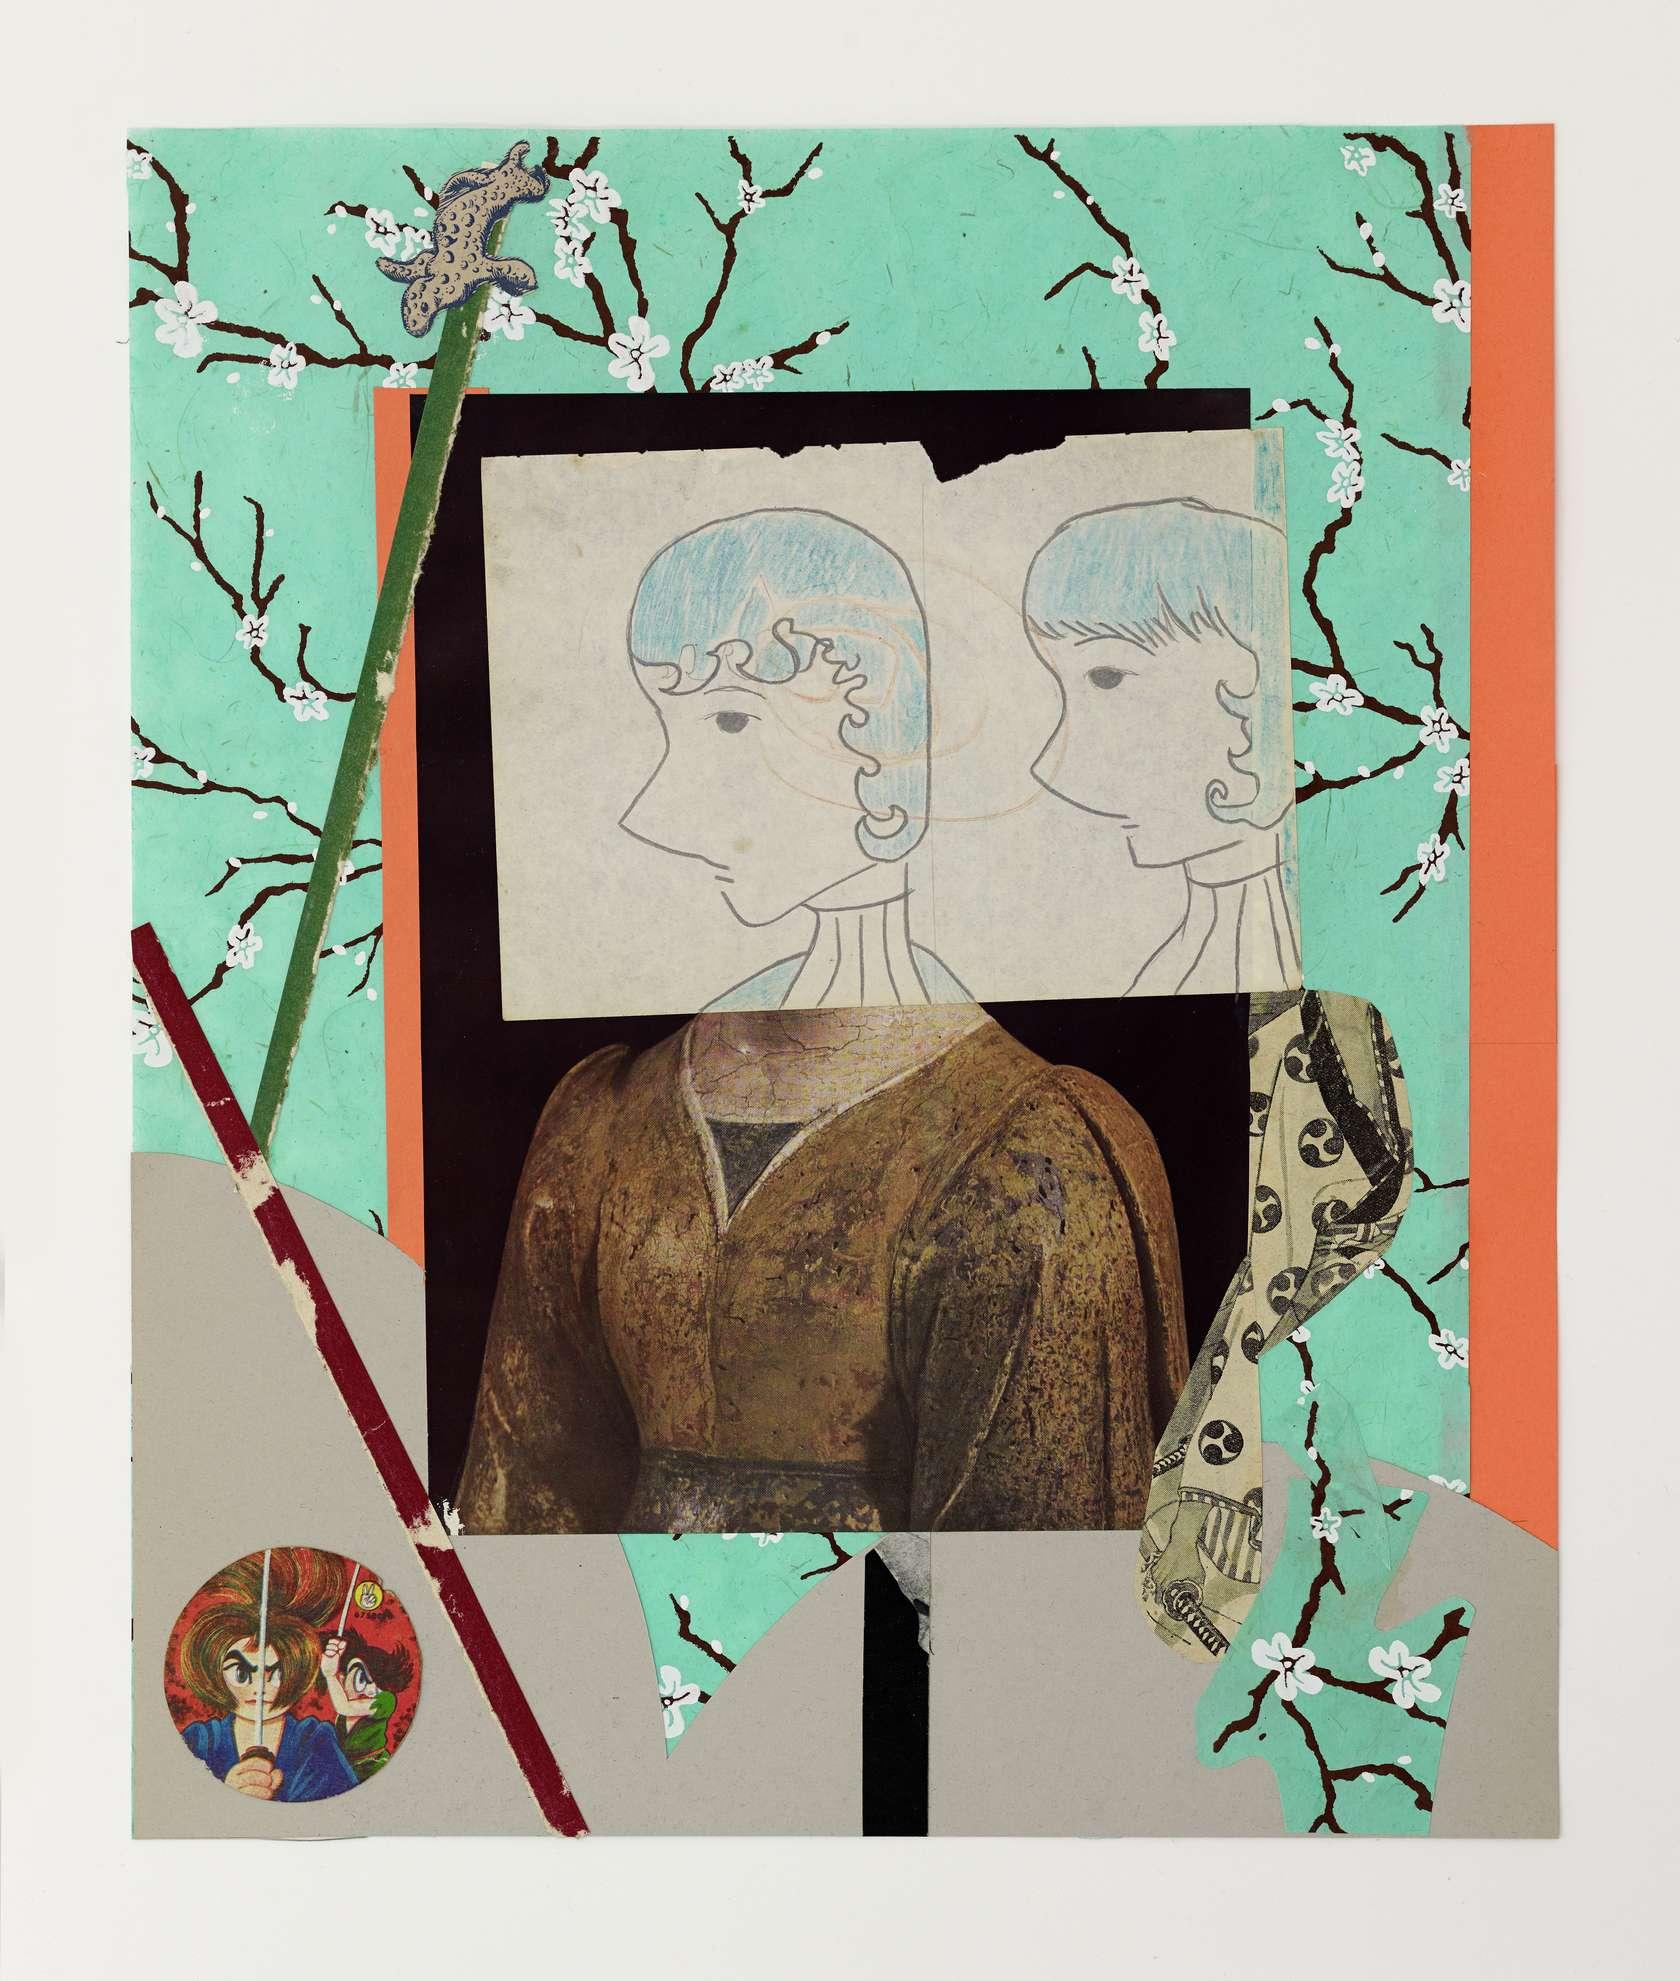 Hippolyte Hentgen, Sanjo Dori, 2019 Collage sur papier45 × 37.5 cm / 17 6/8 × 14 6/8 in.